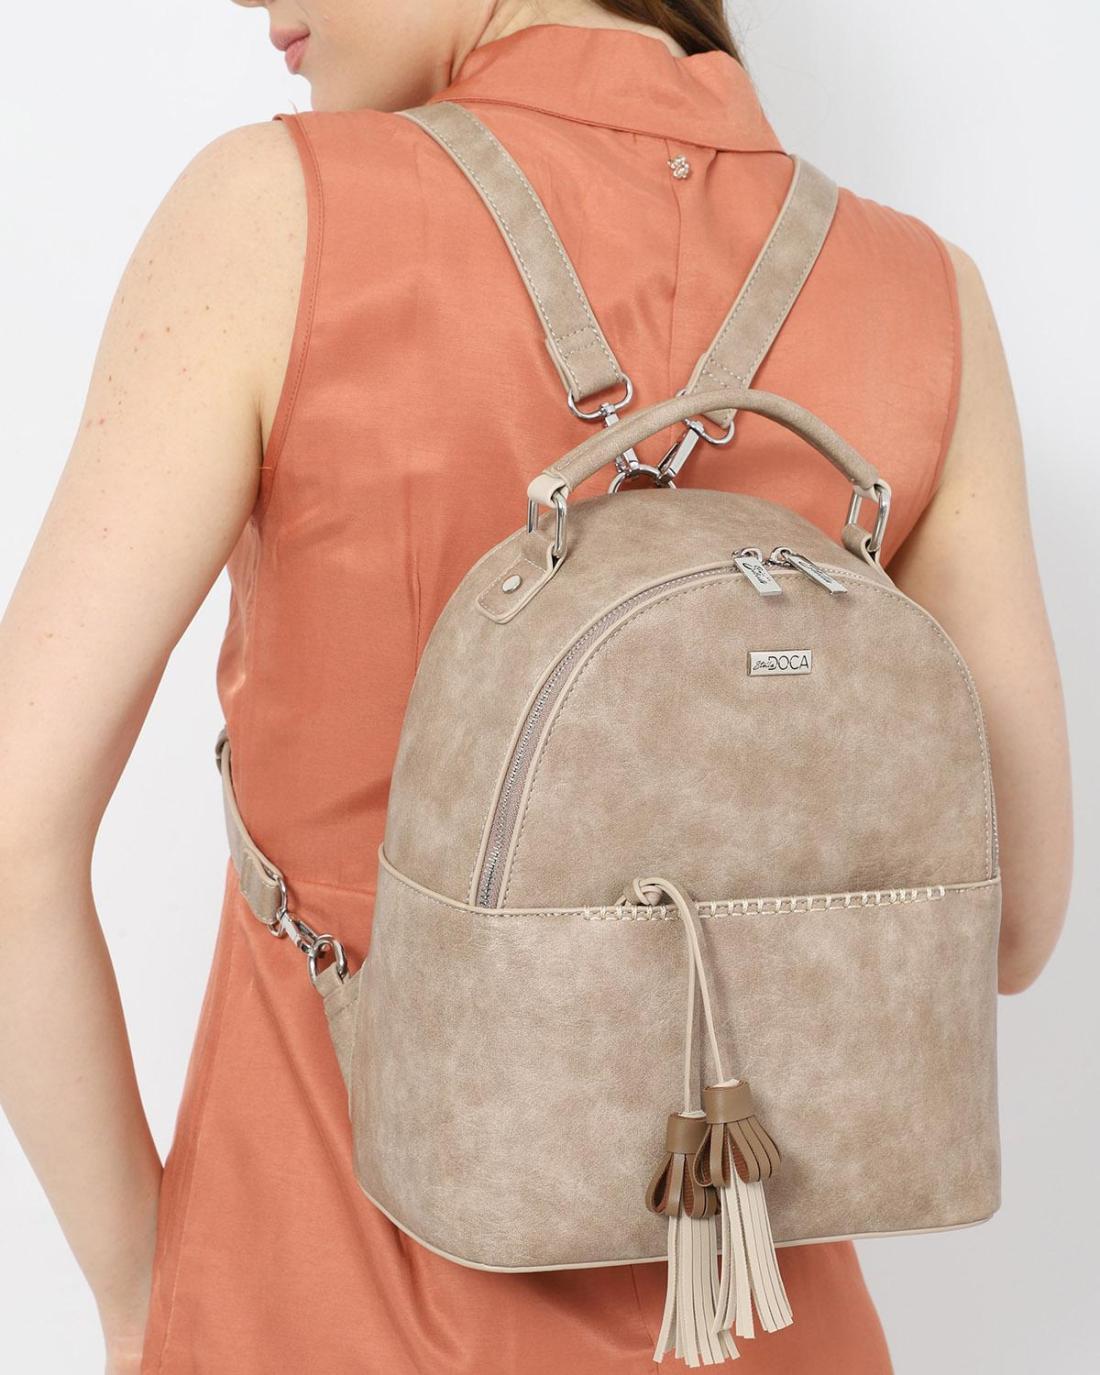 White backpack